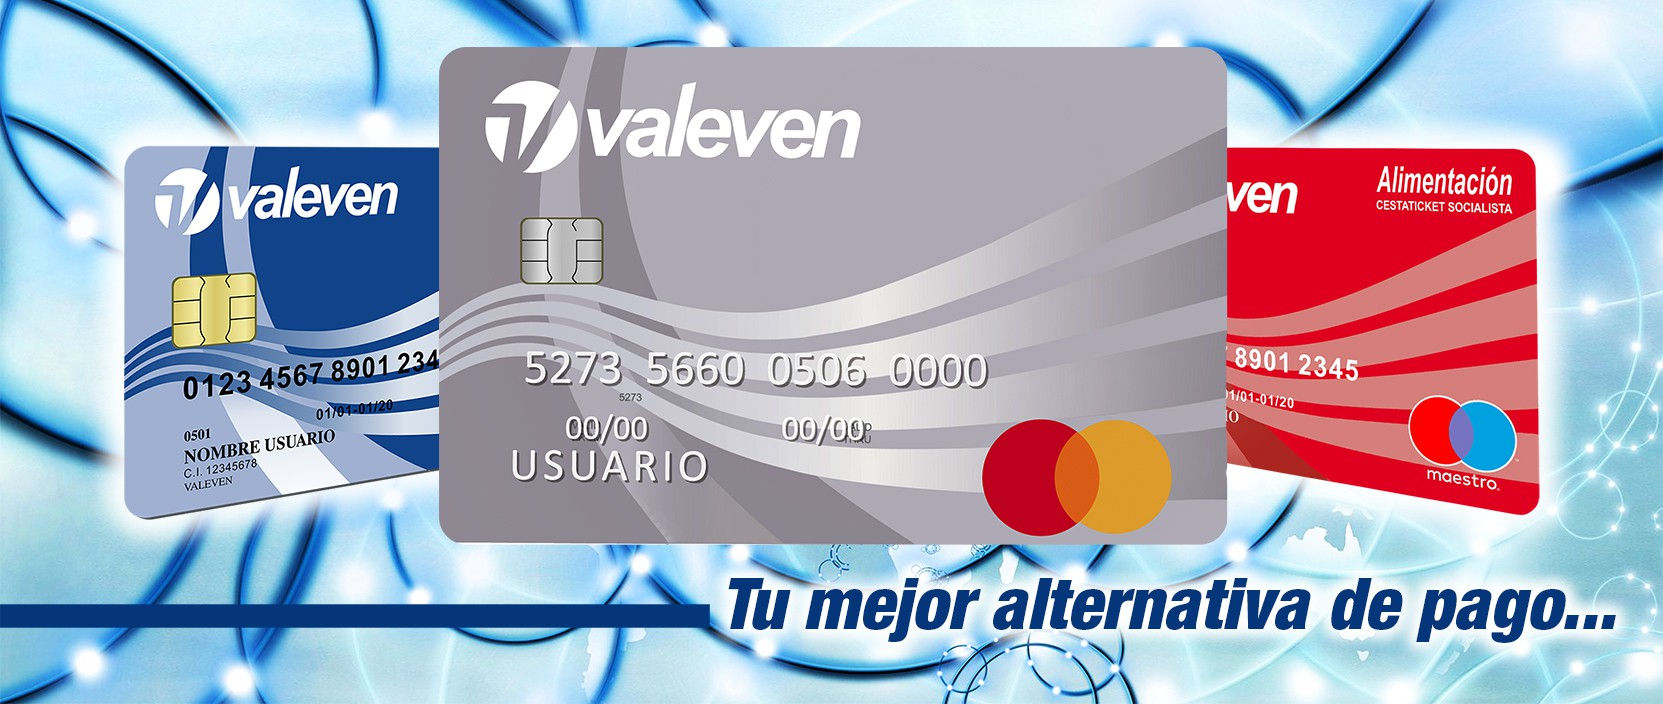 Consulta en Valeven